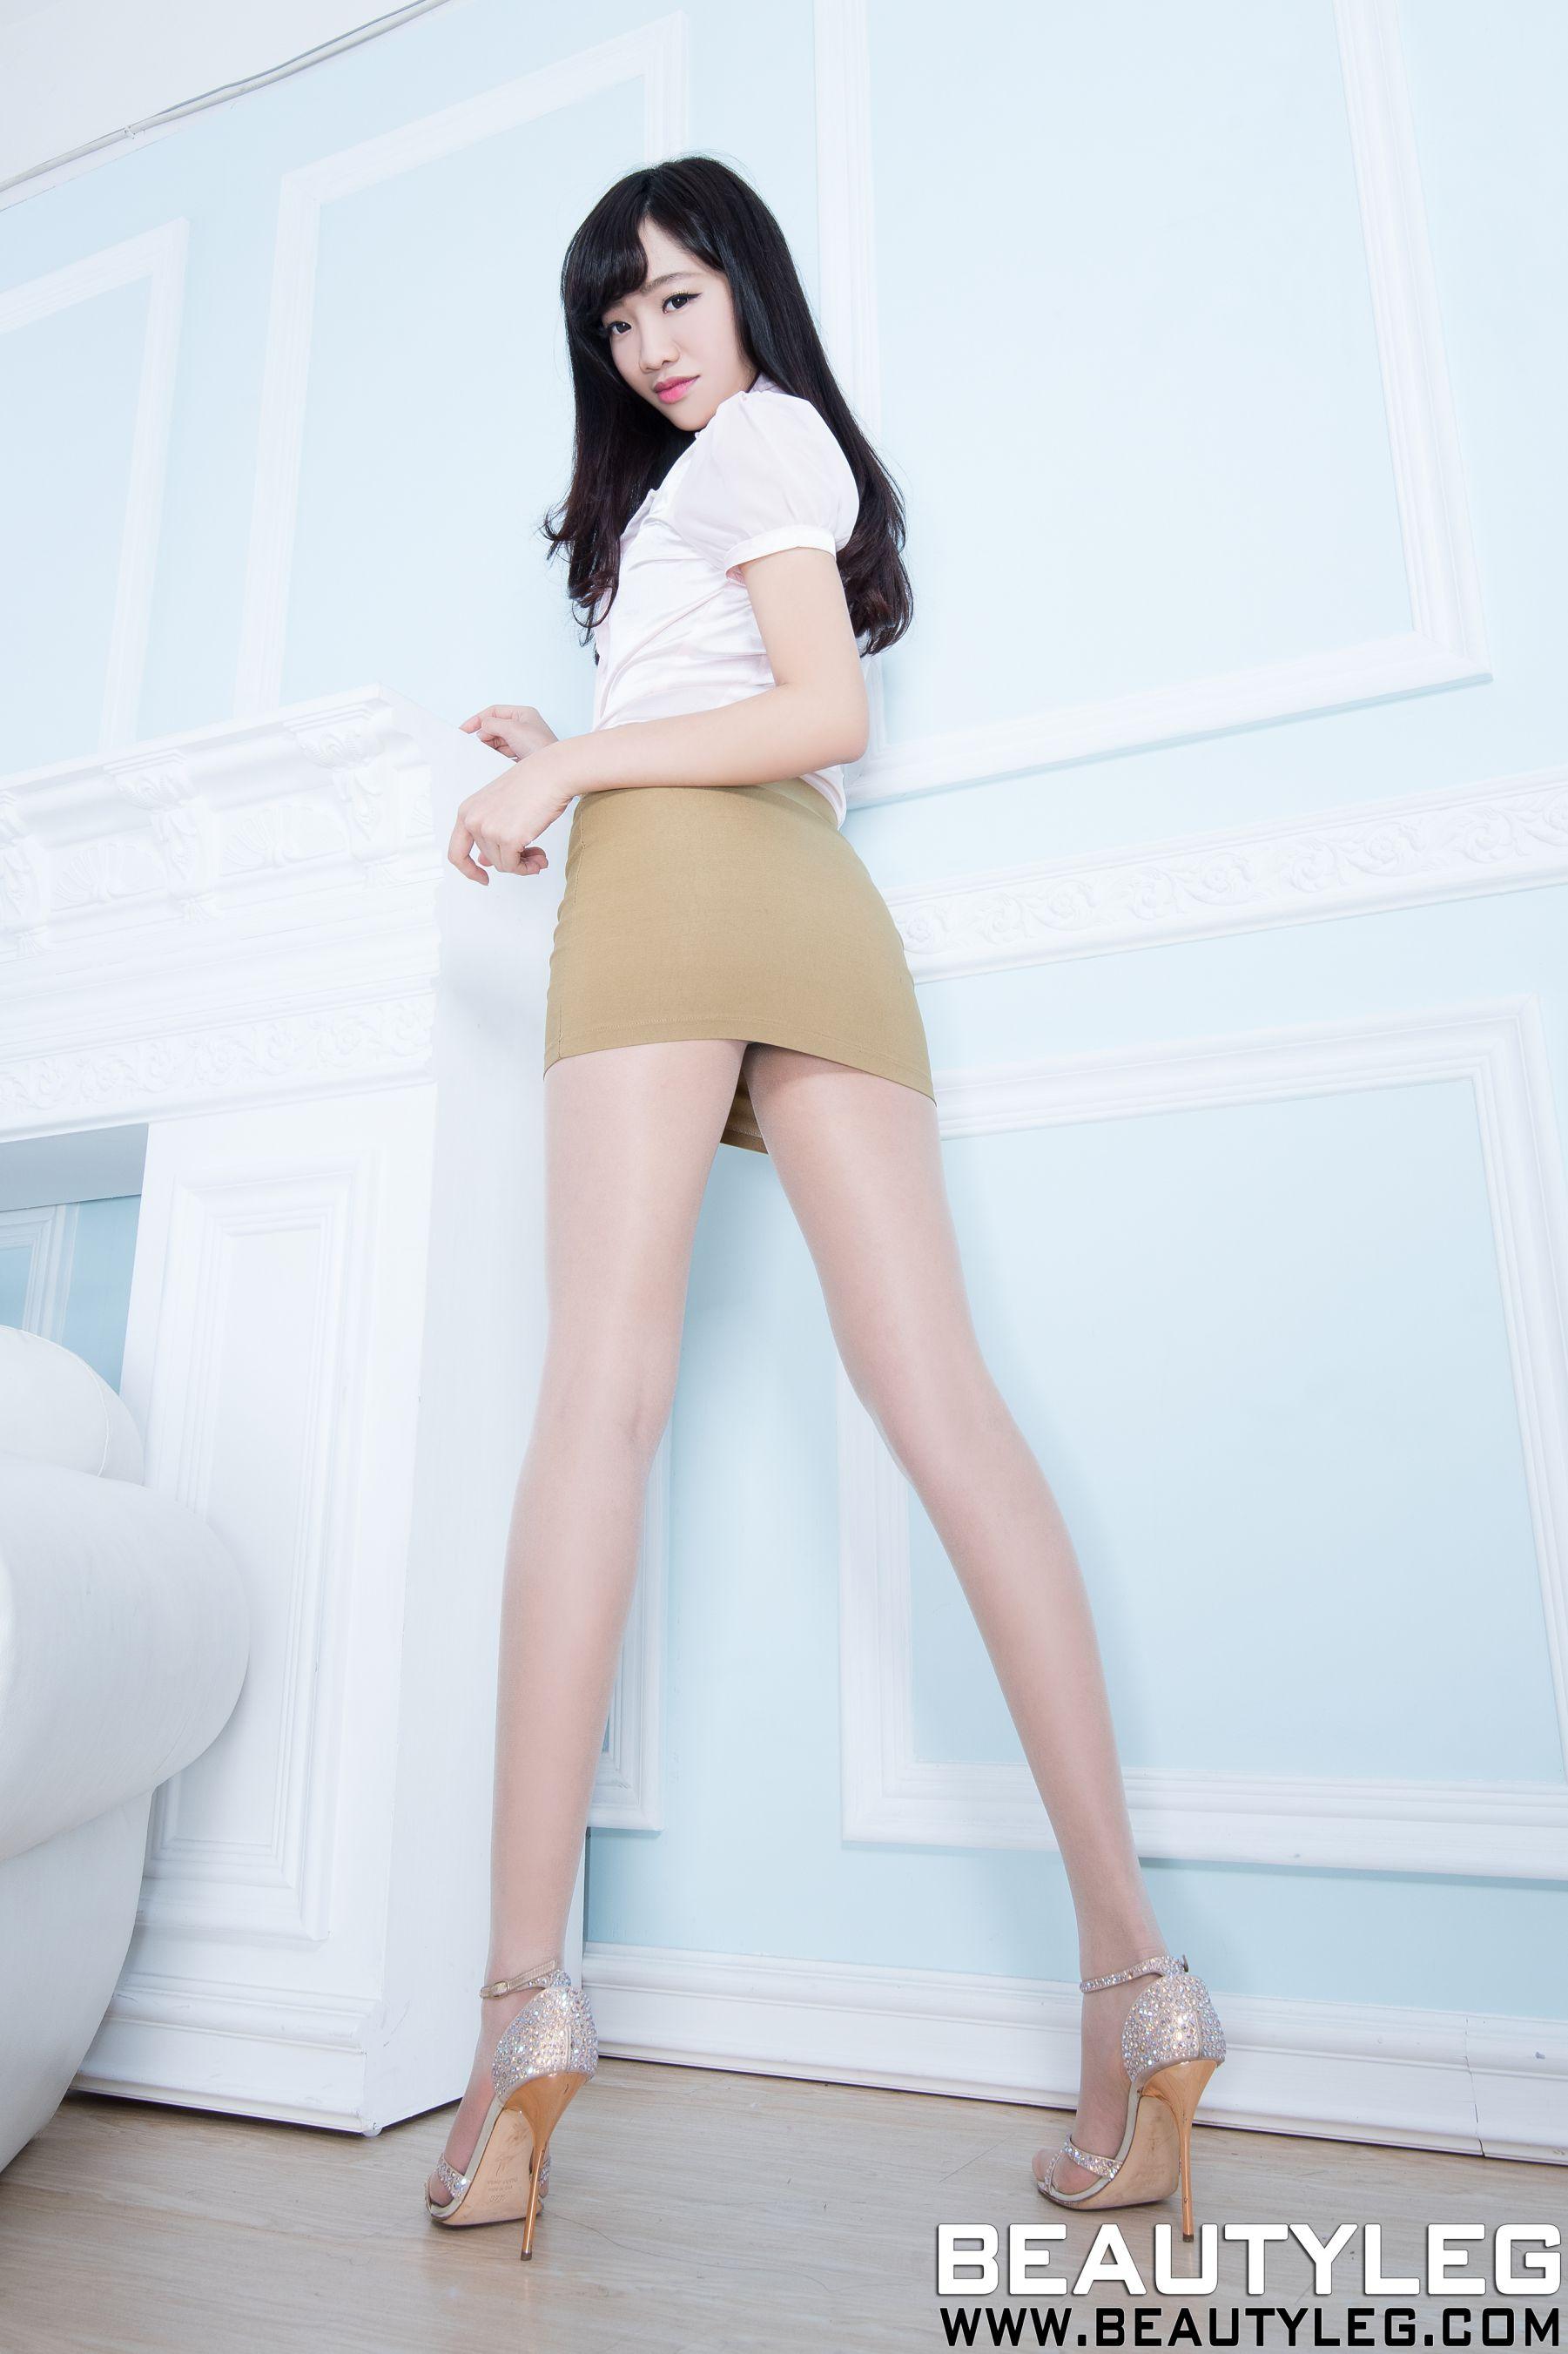 VOL.1118 [Beautyleg]美腿:欣洁(腿模Celia)高品质写真套图(39P)